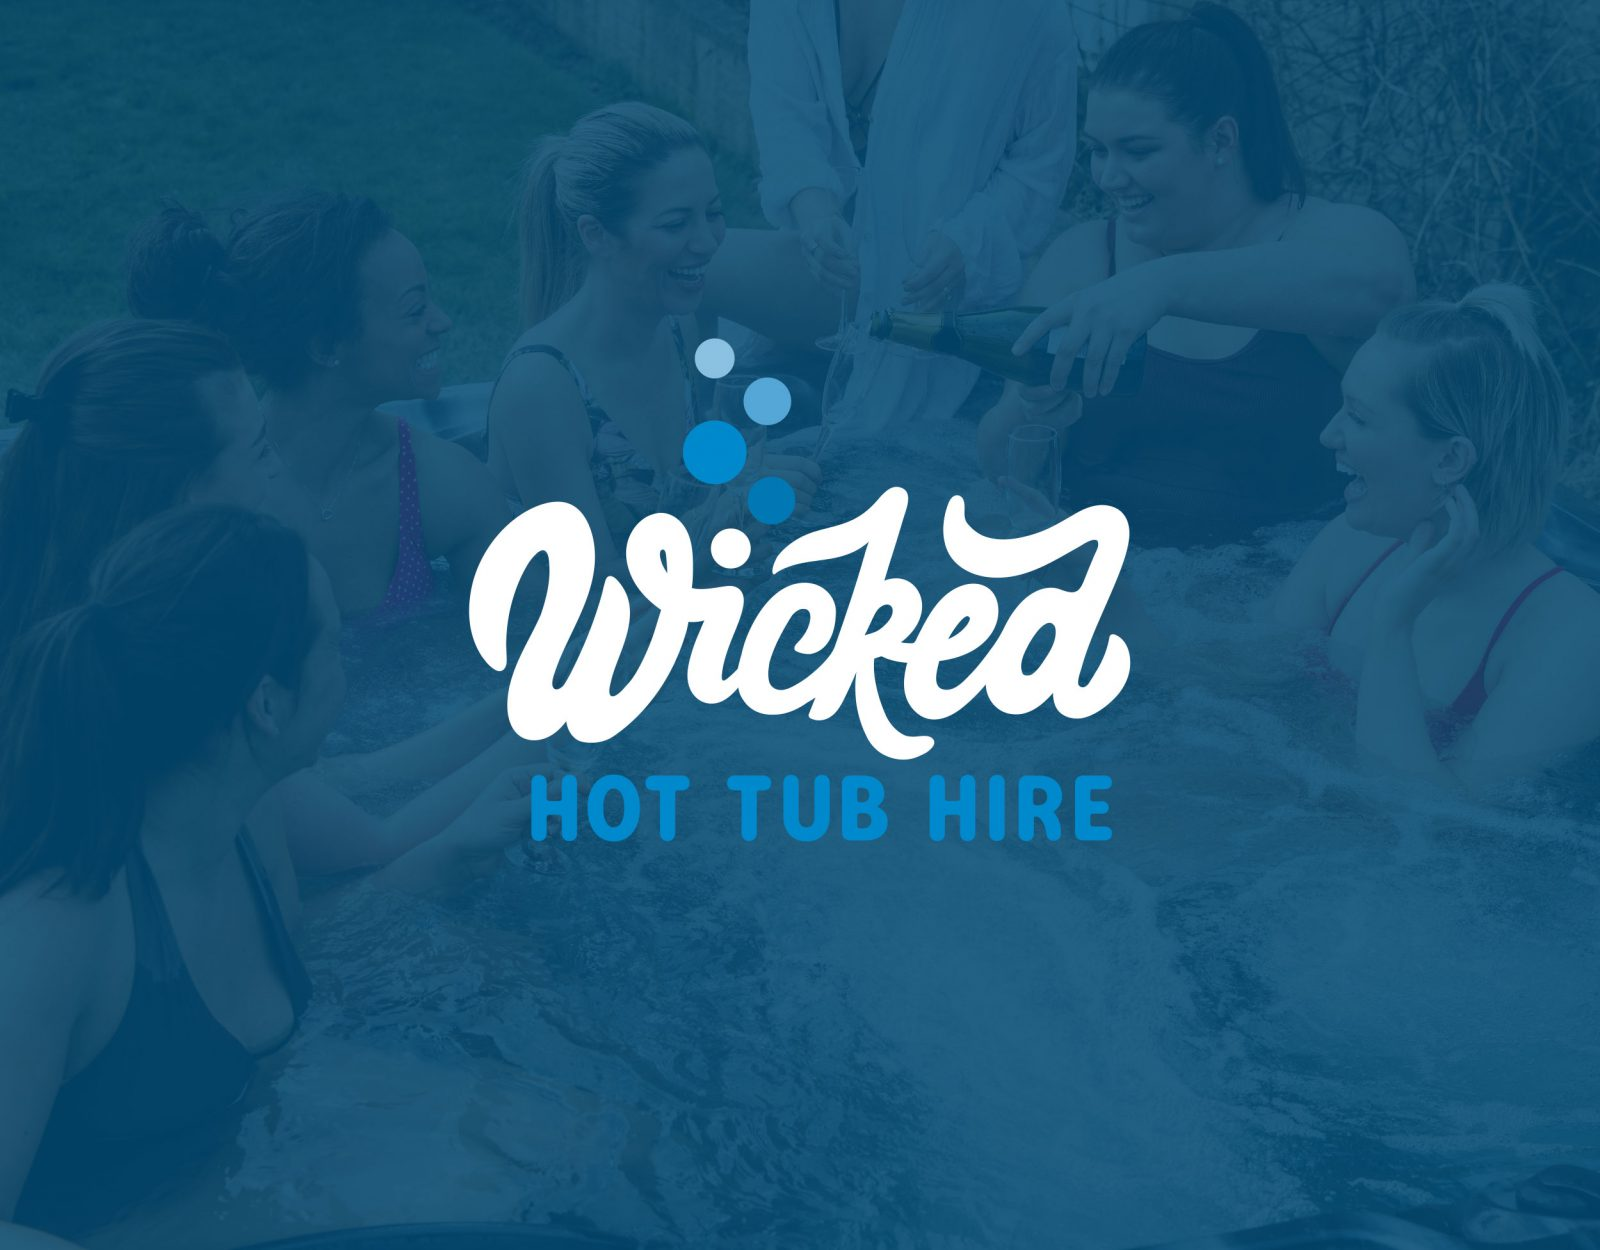 Wicked Hot Tub Hire logo